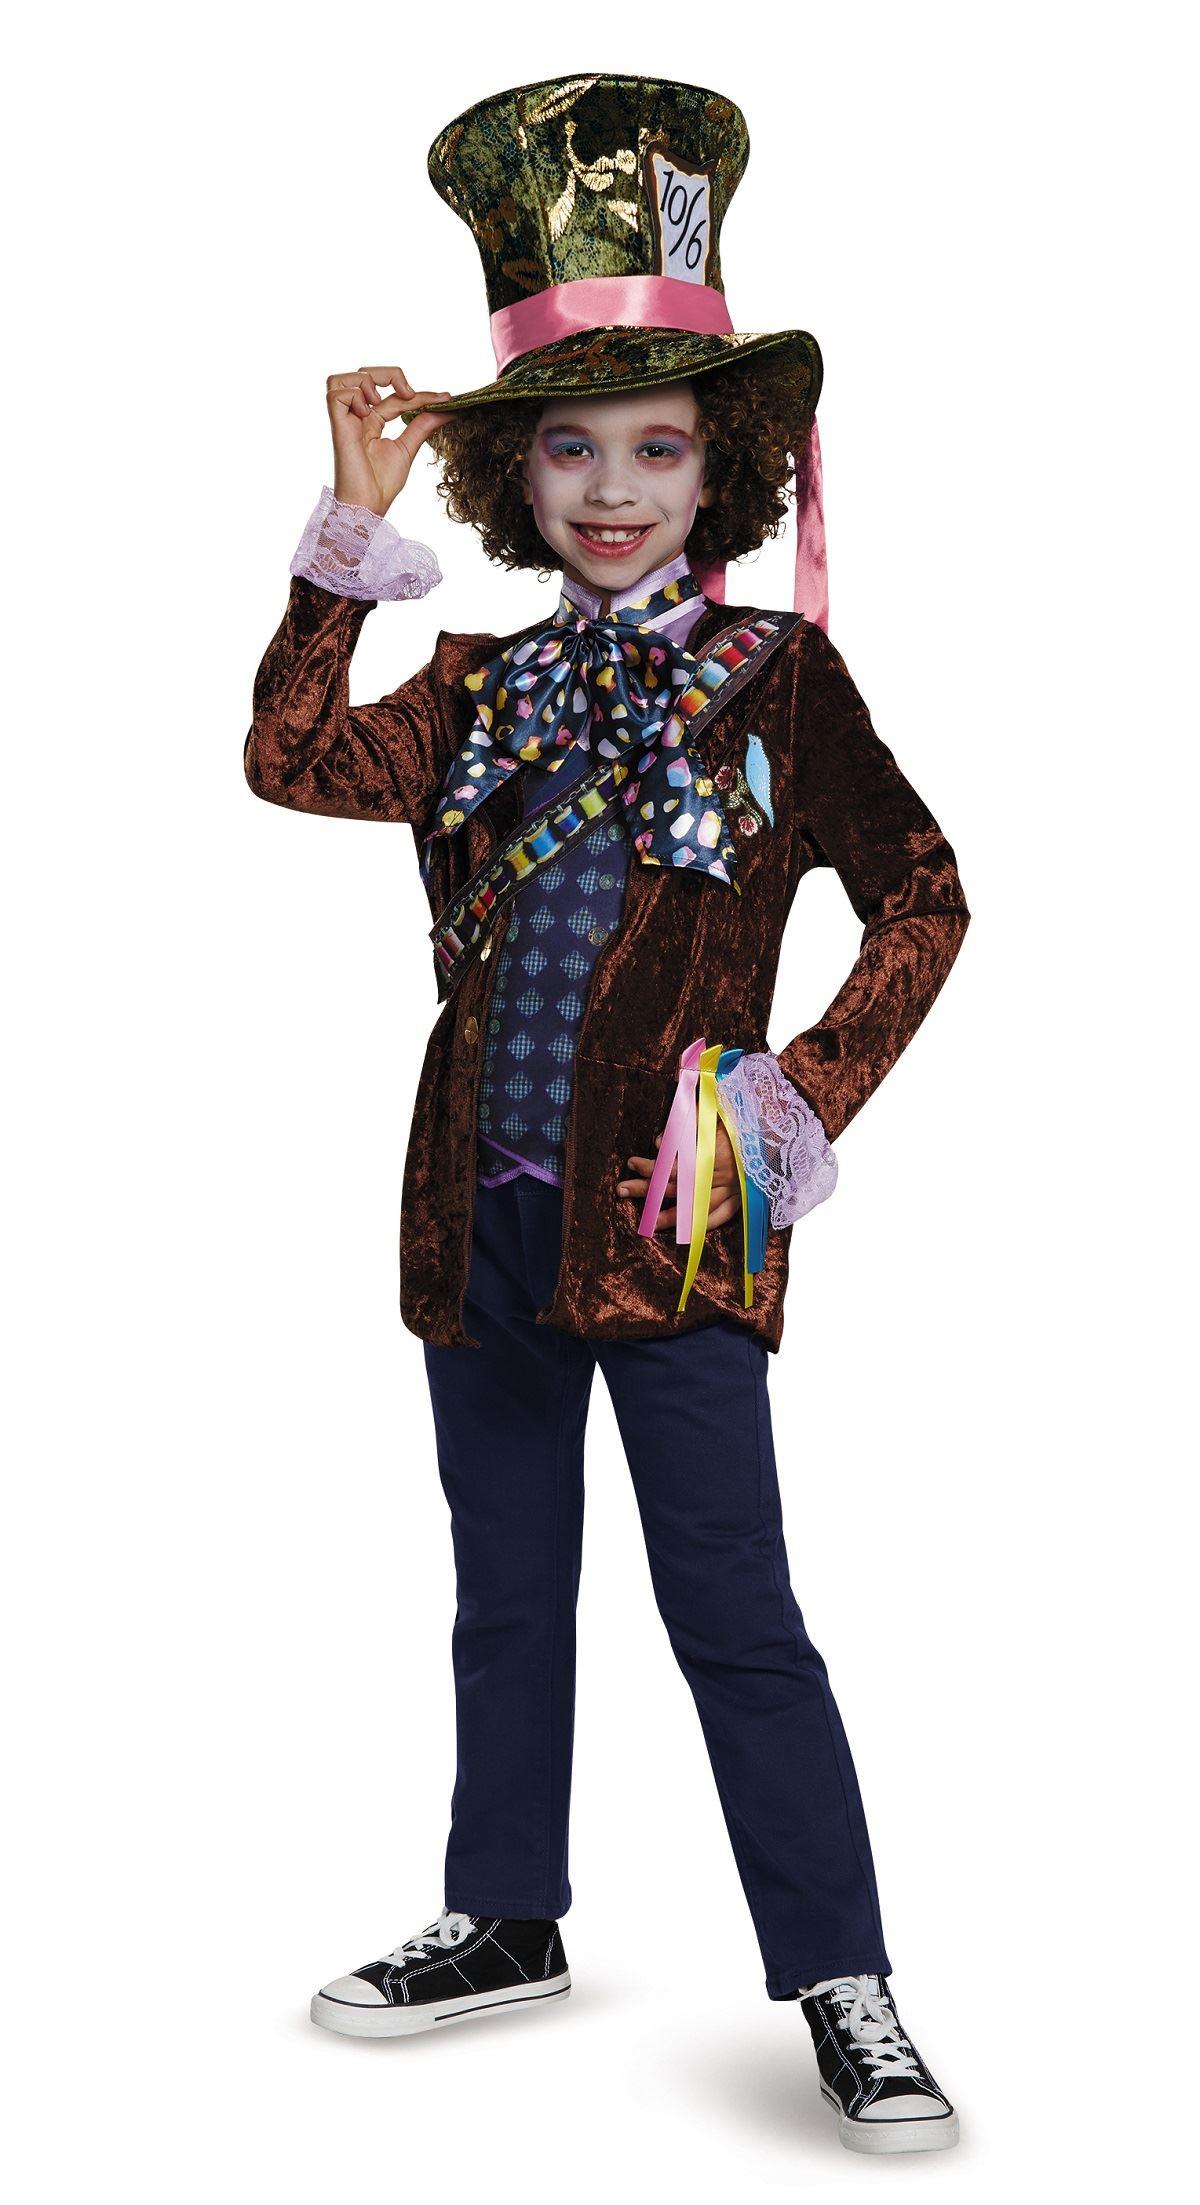 Kids Mad Hatter Licensed Disney Boys Story Book Costume 21 99 The Costume Land